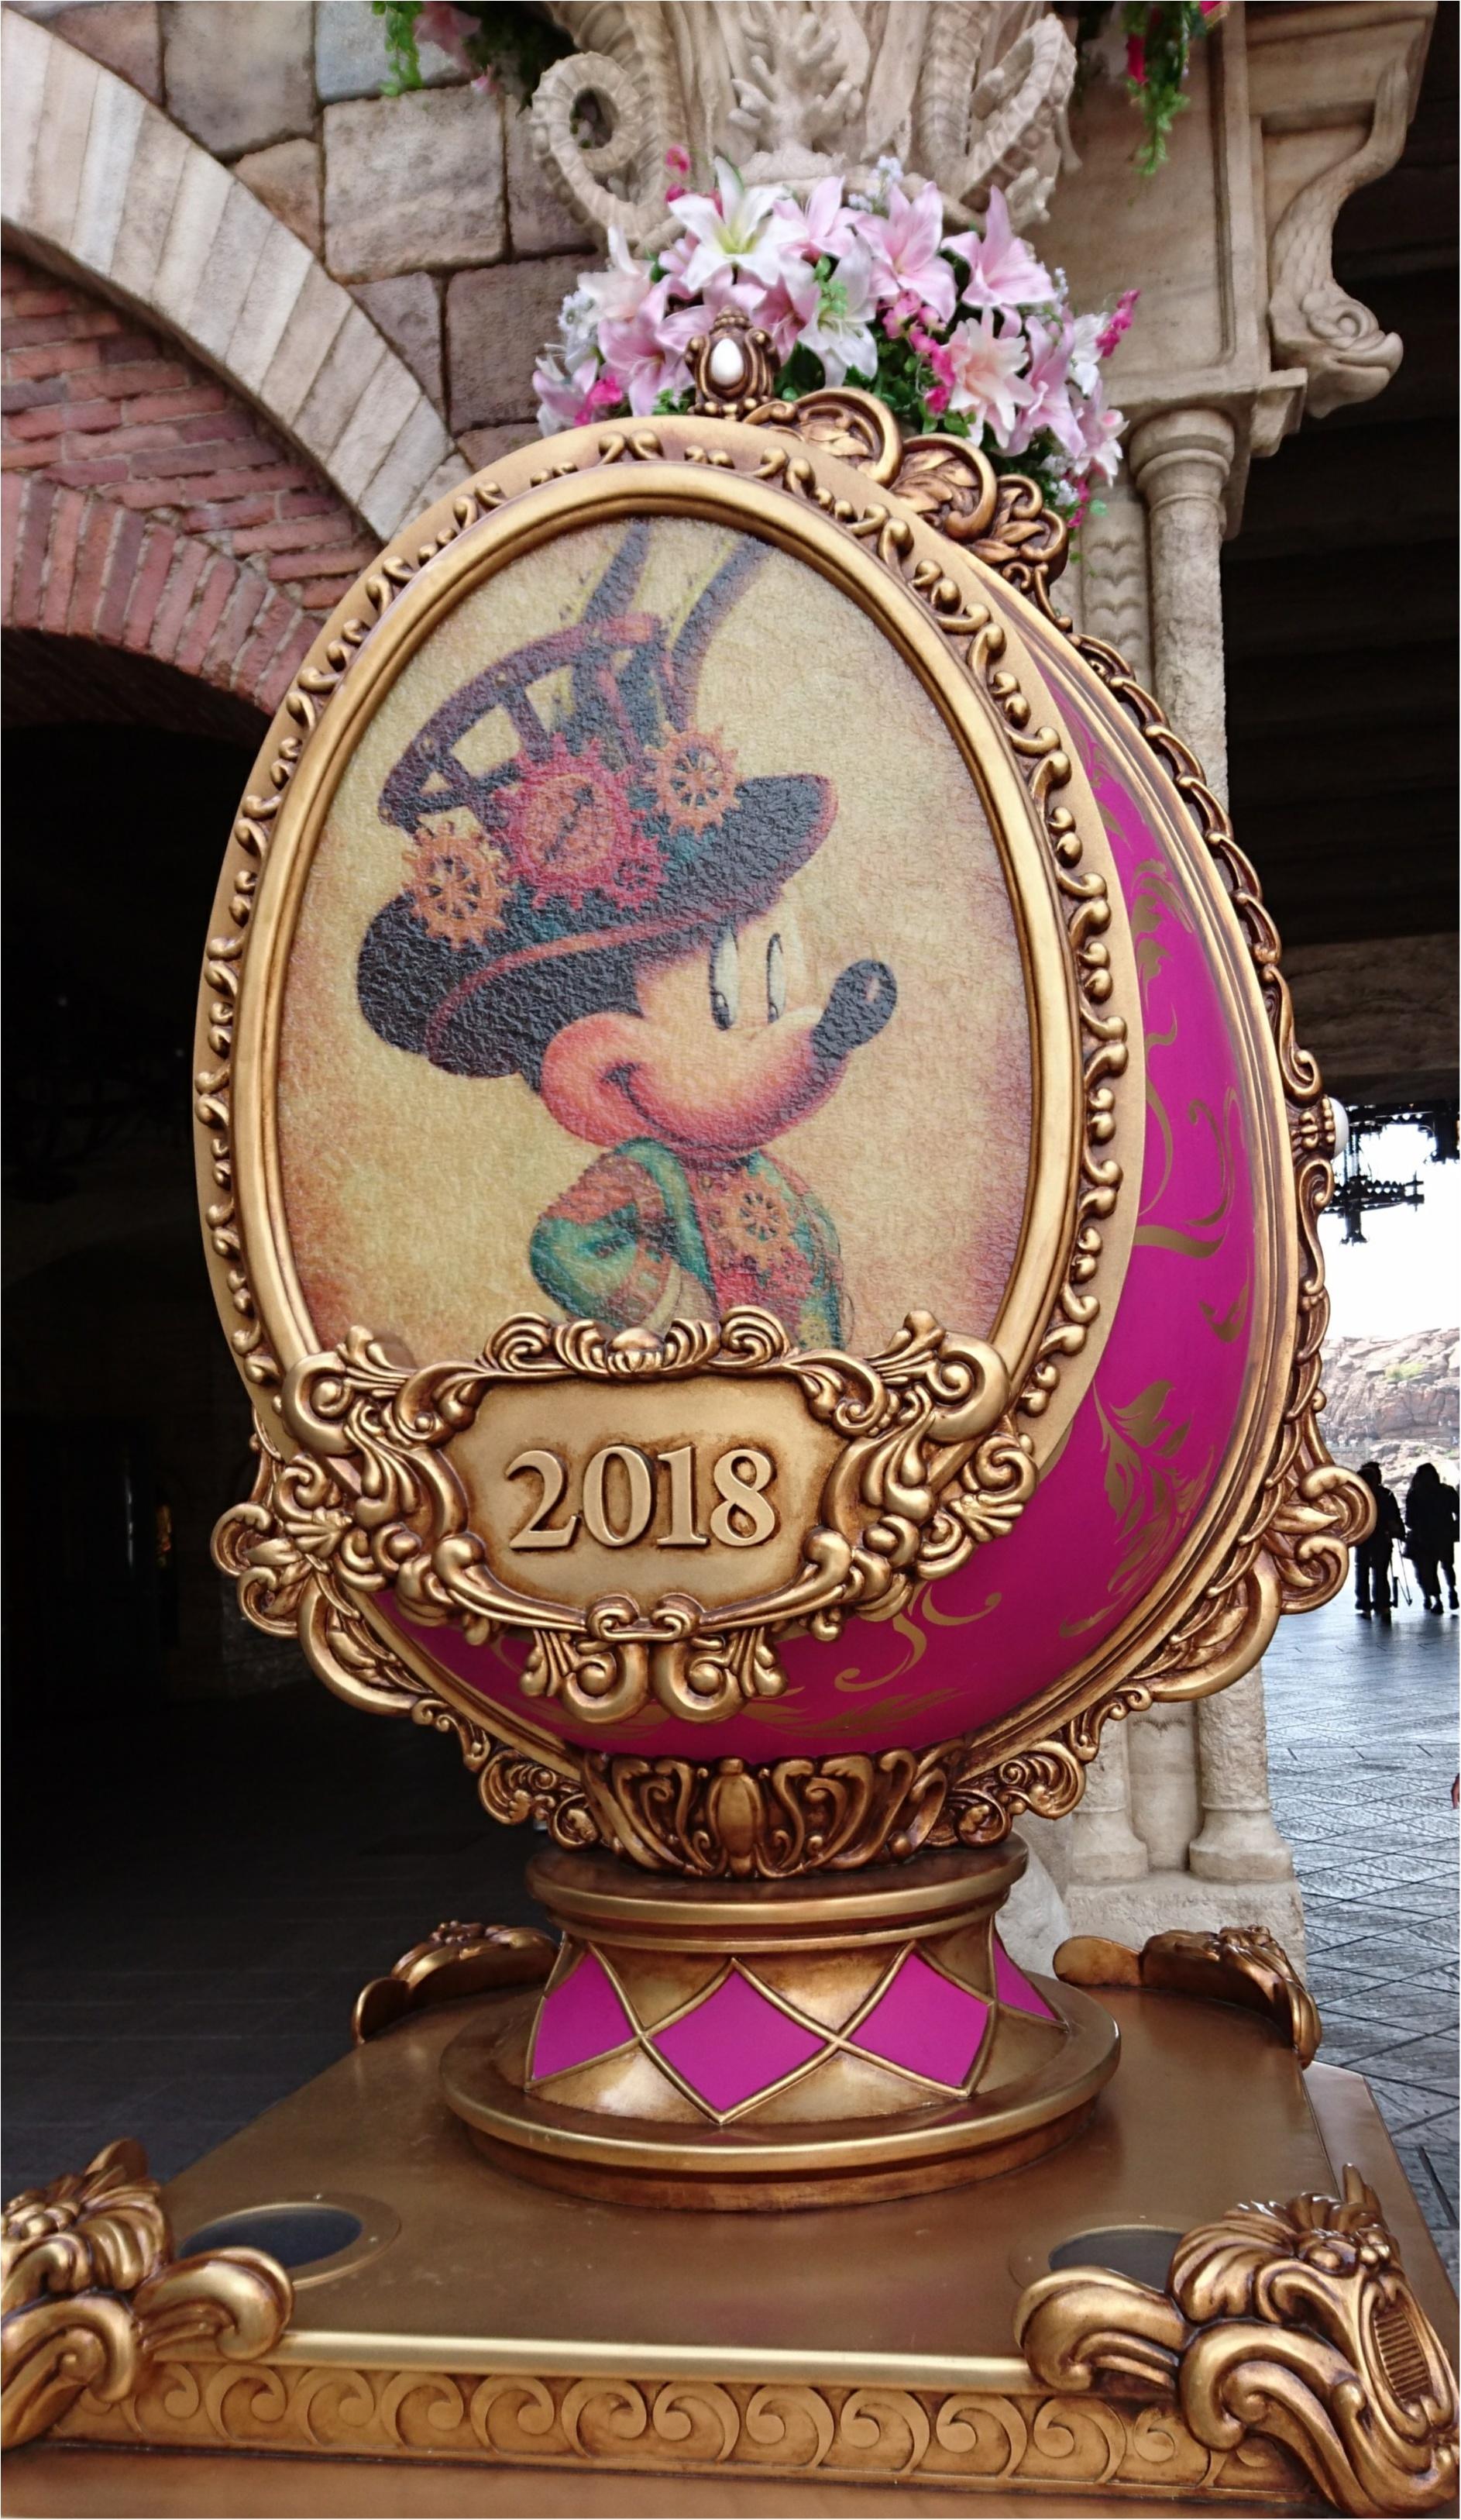 【Disney特集】東京ディズニーシーのイースターに行って来ました♡_2_1